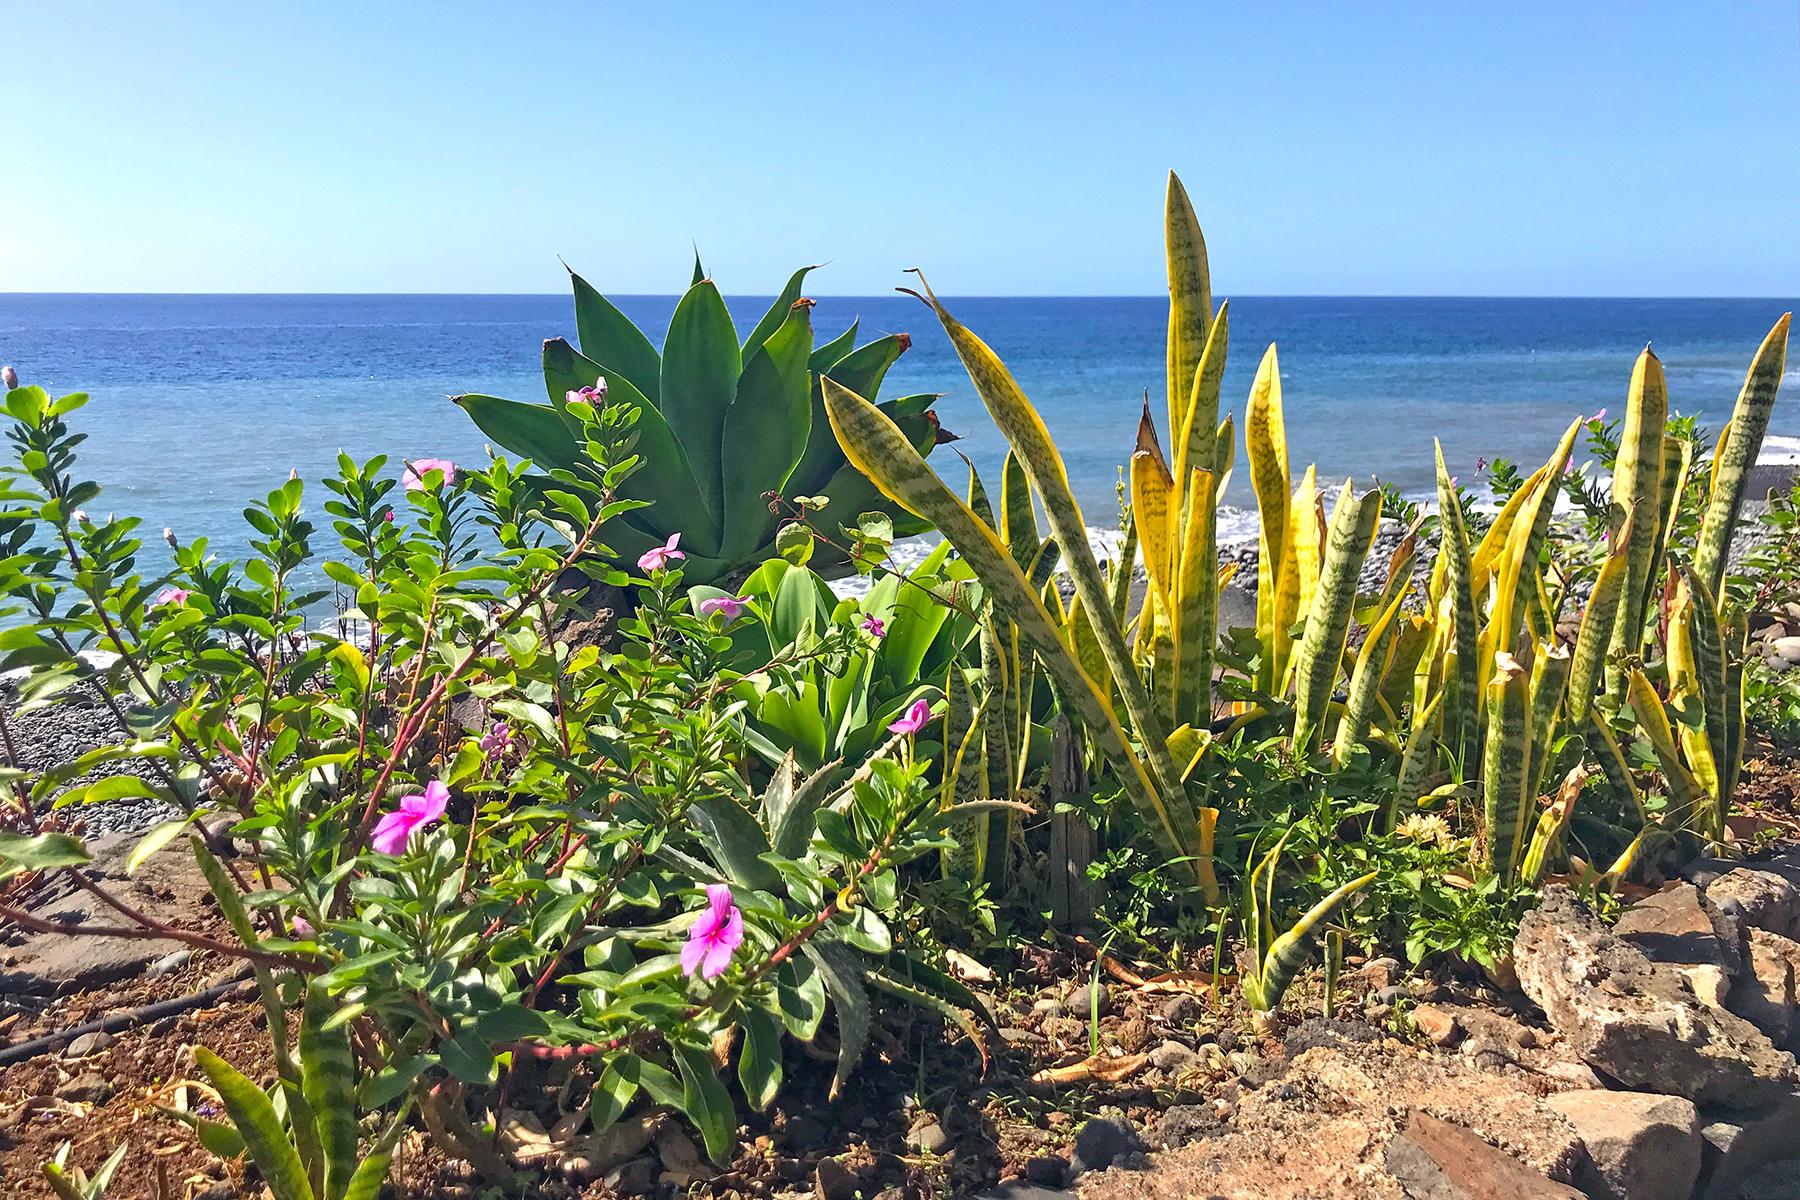 Fajã dos Padres: Die Insel an der Insel auf Madeira